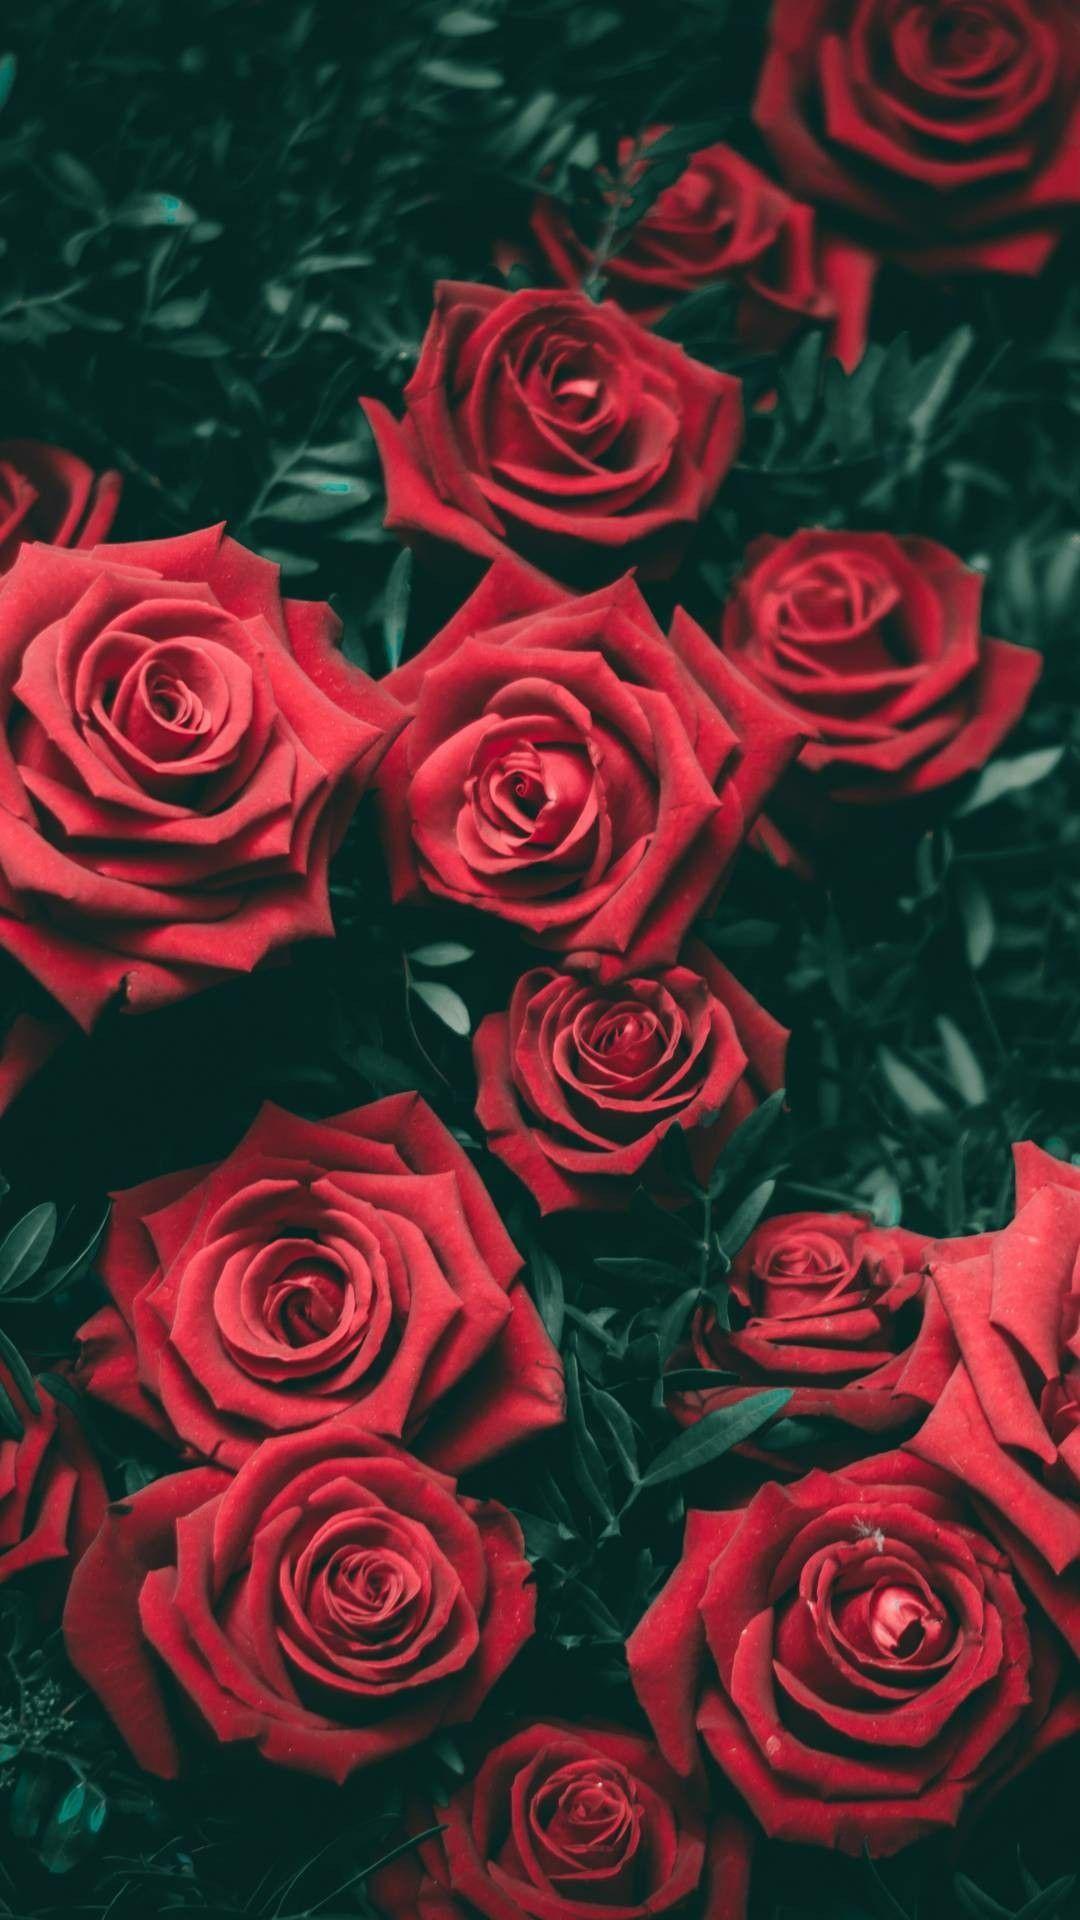 hoa hồng tuyệt đẹp